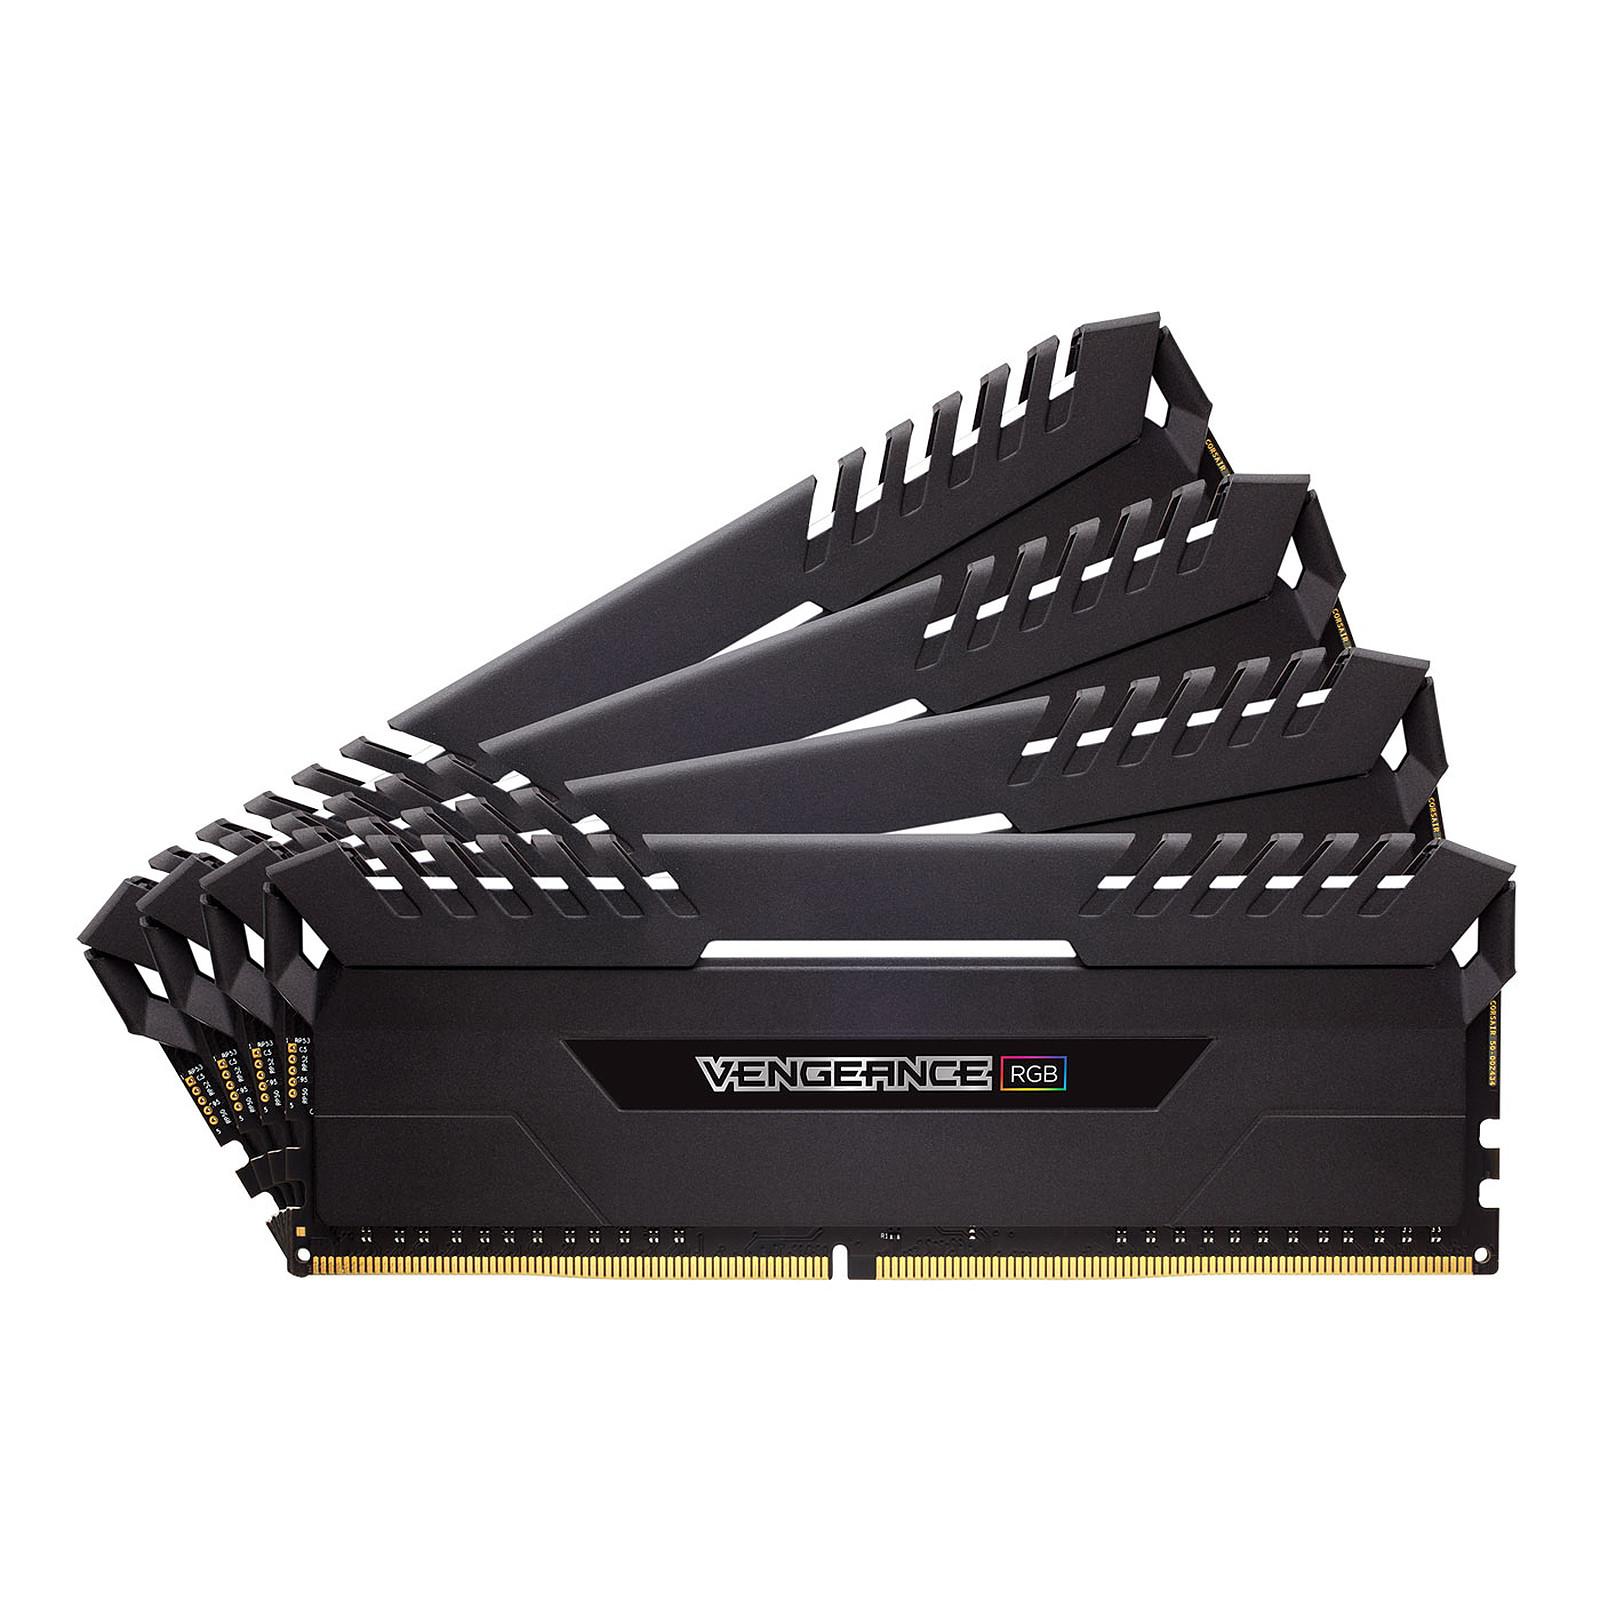 Corsair Vengeance RGB Series 32GB (4x 8GB) DDR4 3600 MHz CL18